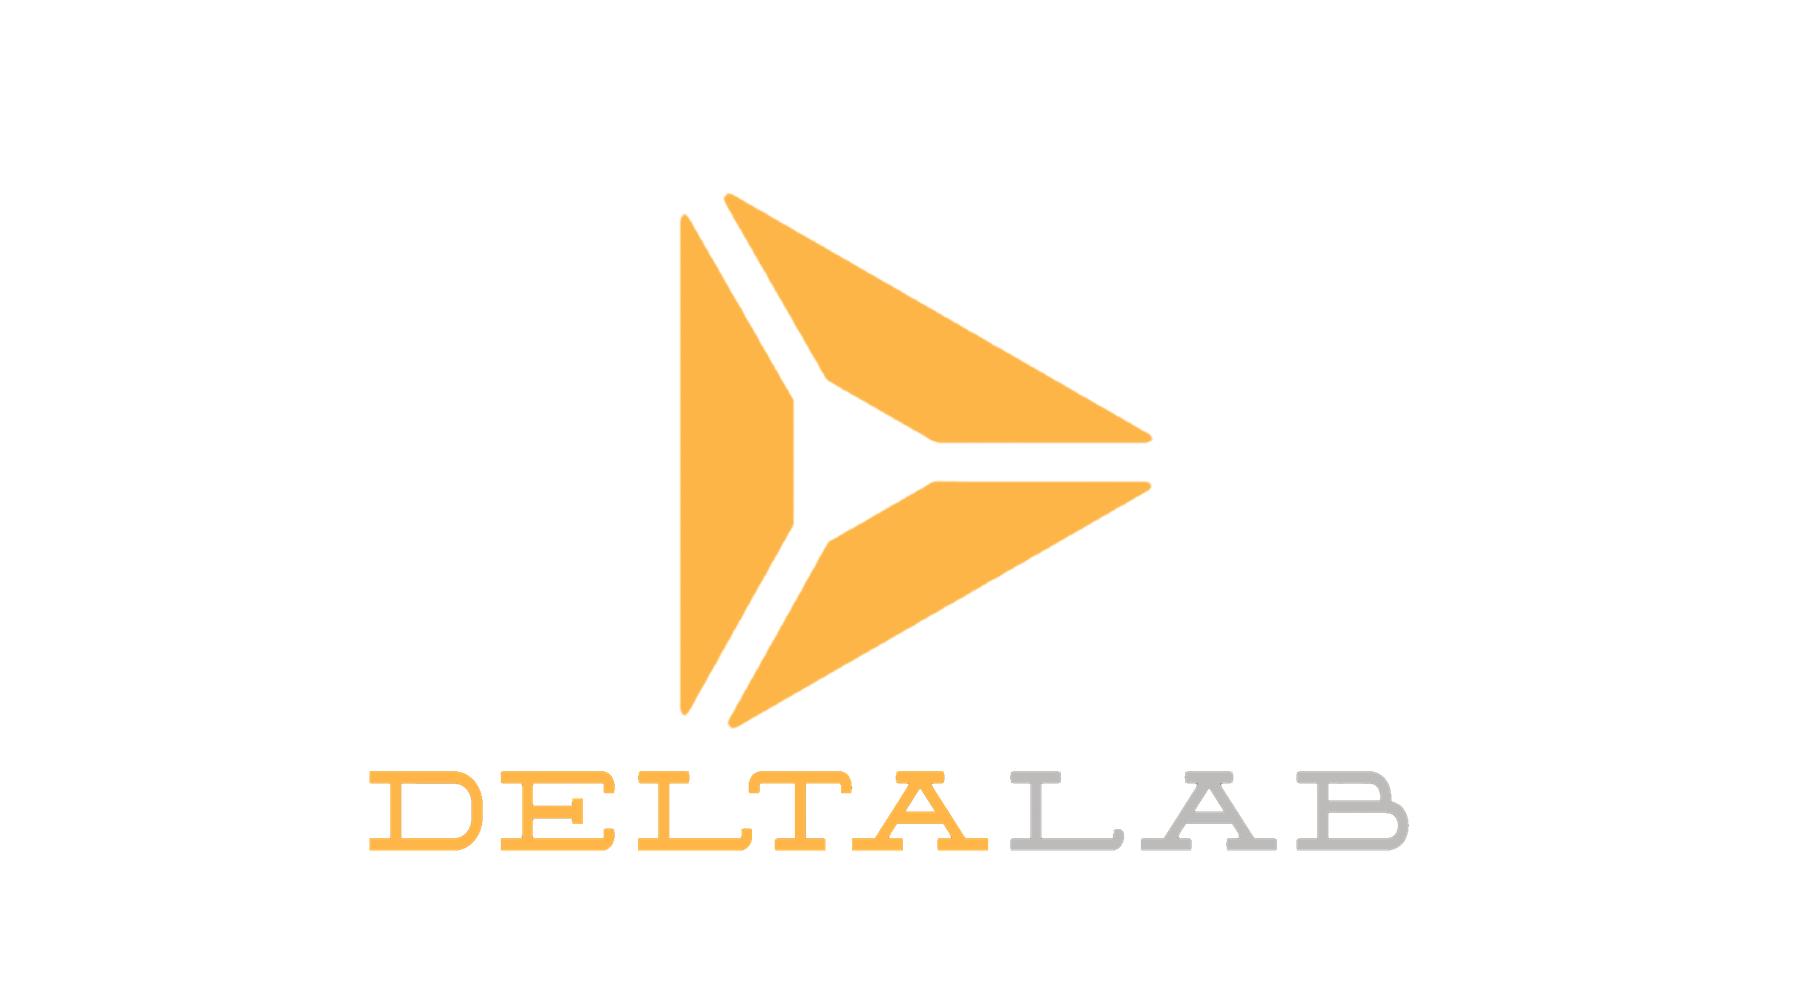 Delta Lab